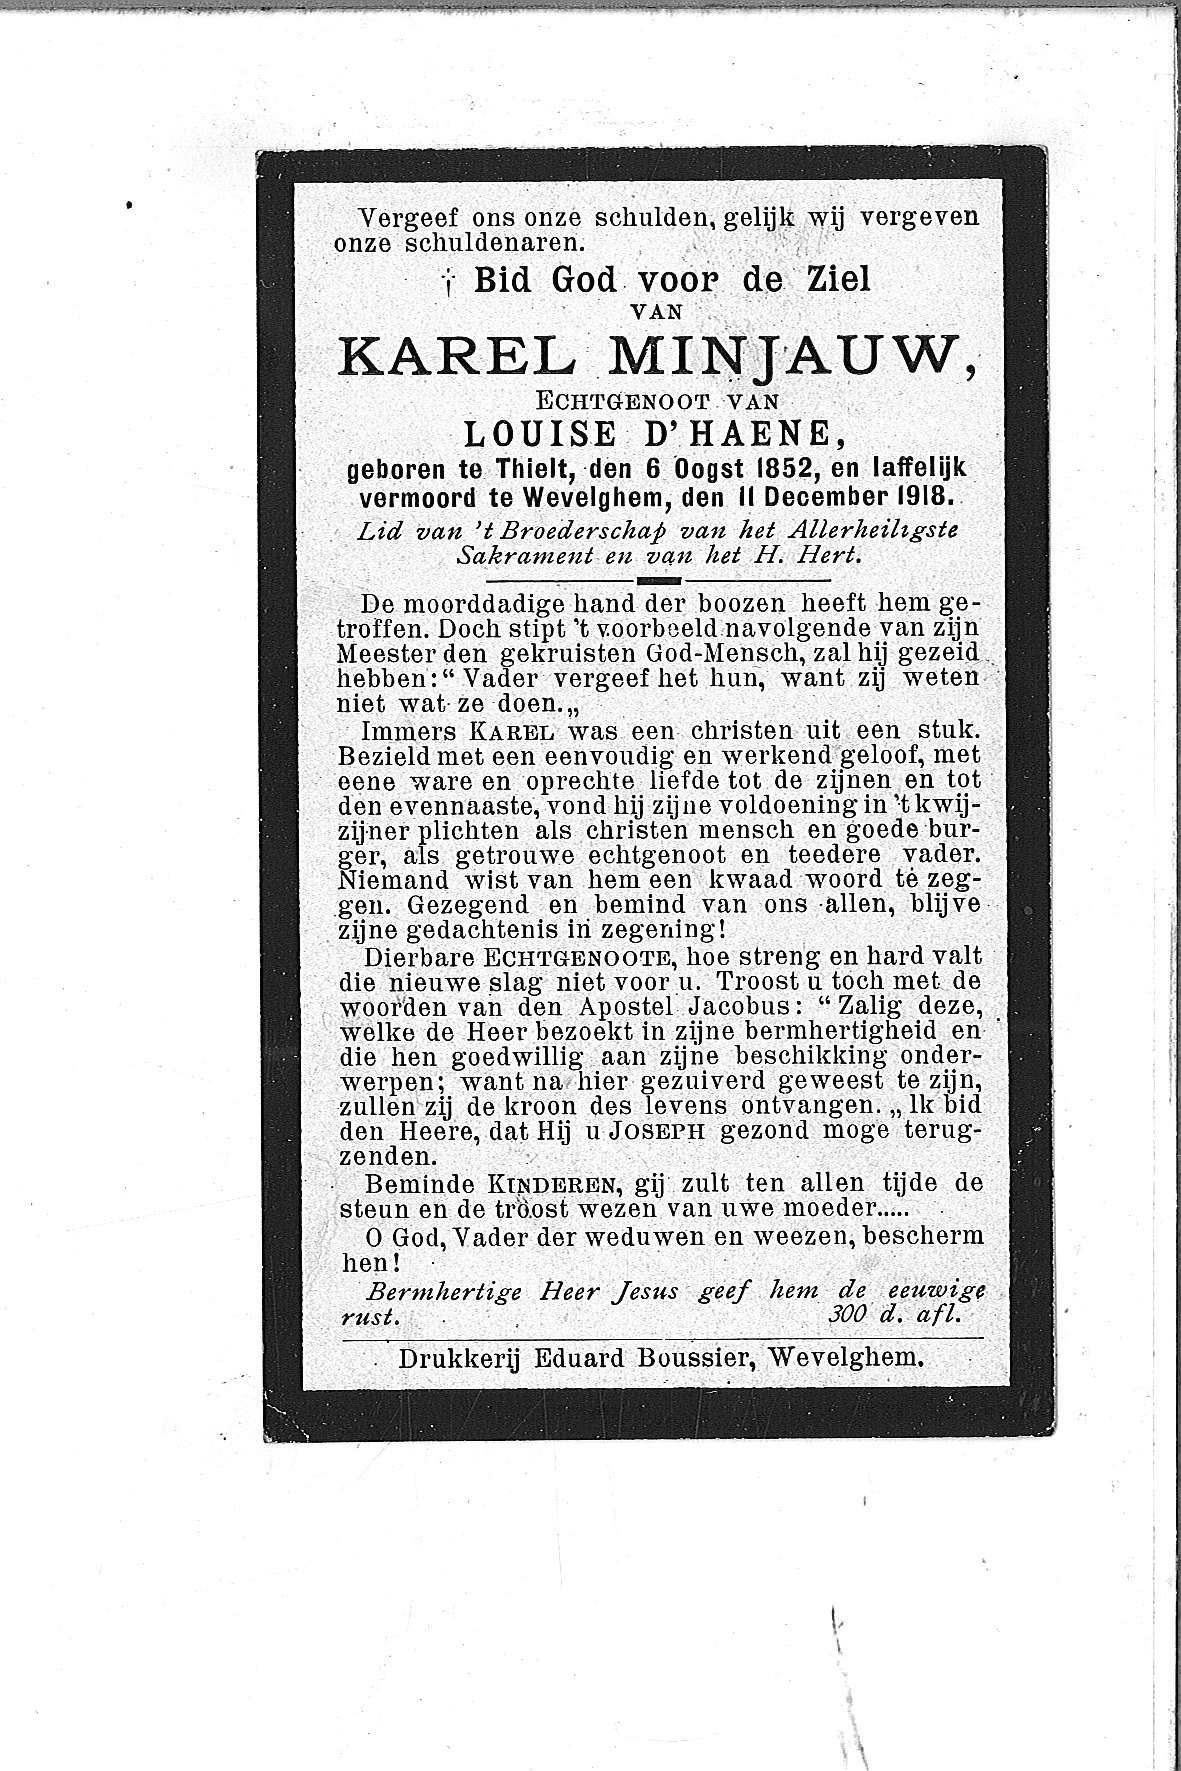 Karel(1918)20140430132205_00085.jpg